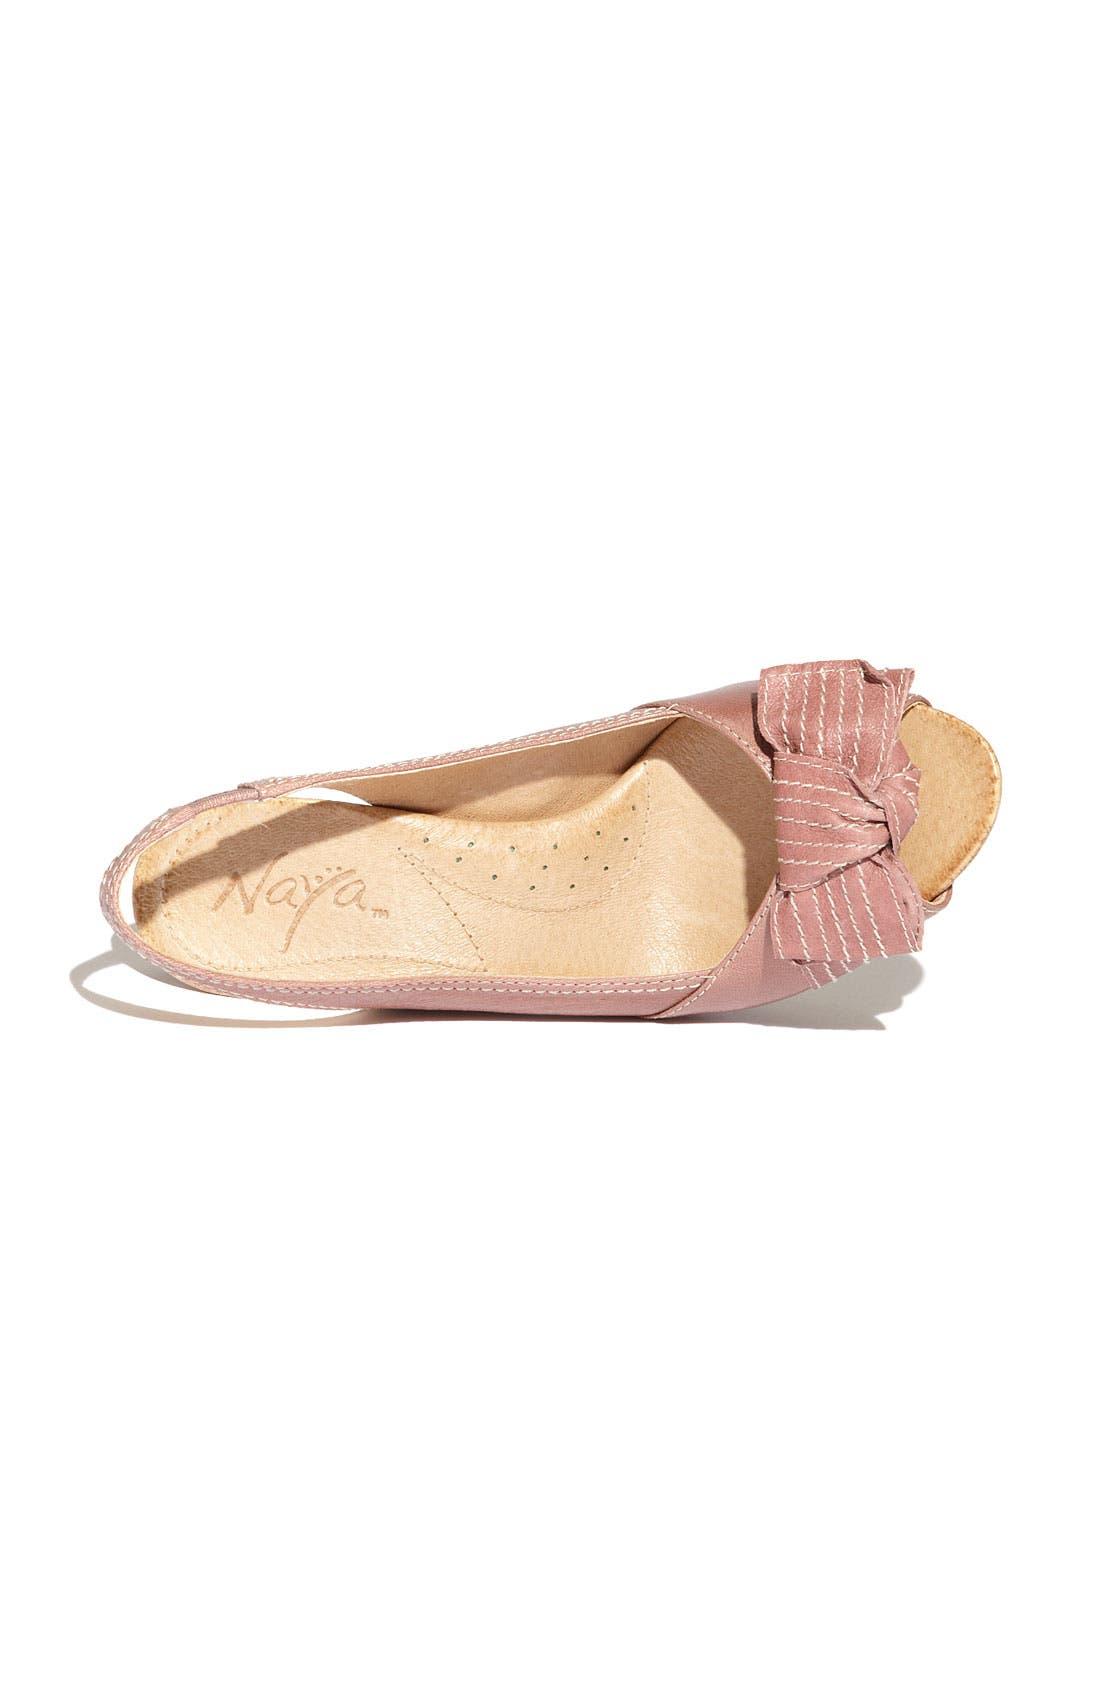 Alternate Image 3  - Naya 'Giada' Sandal